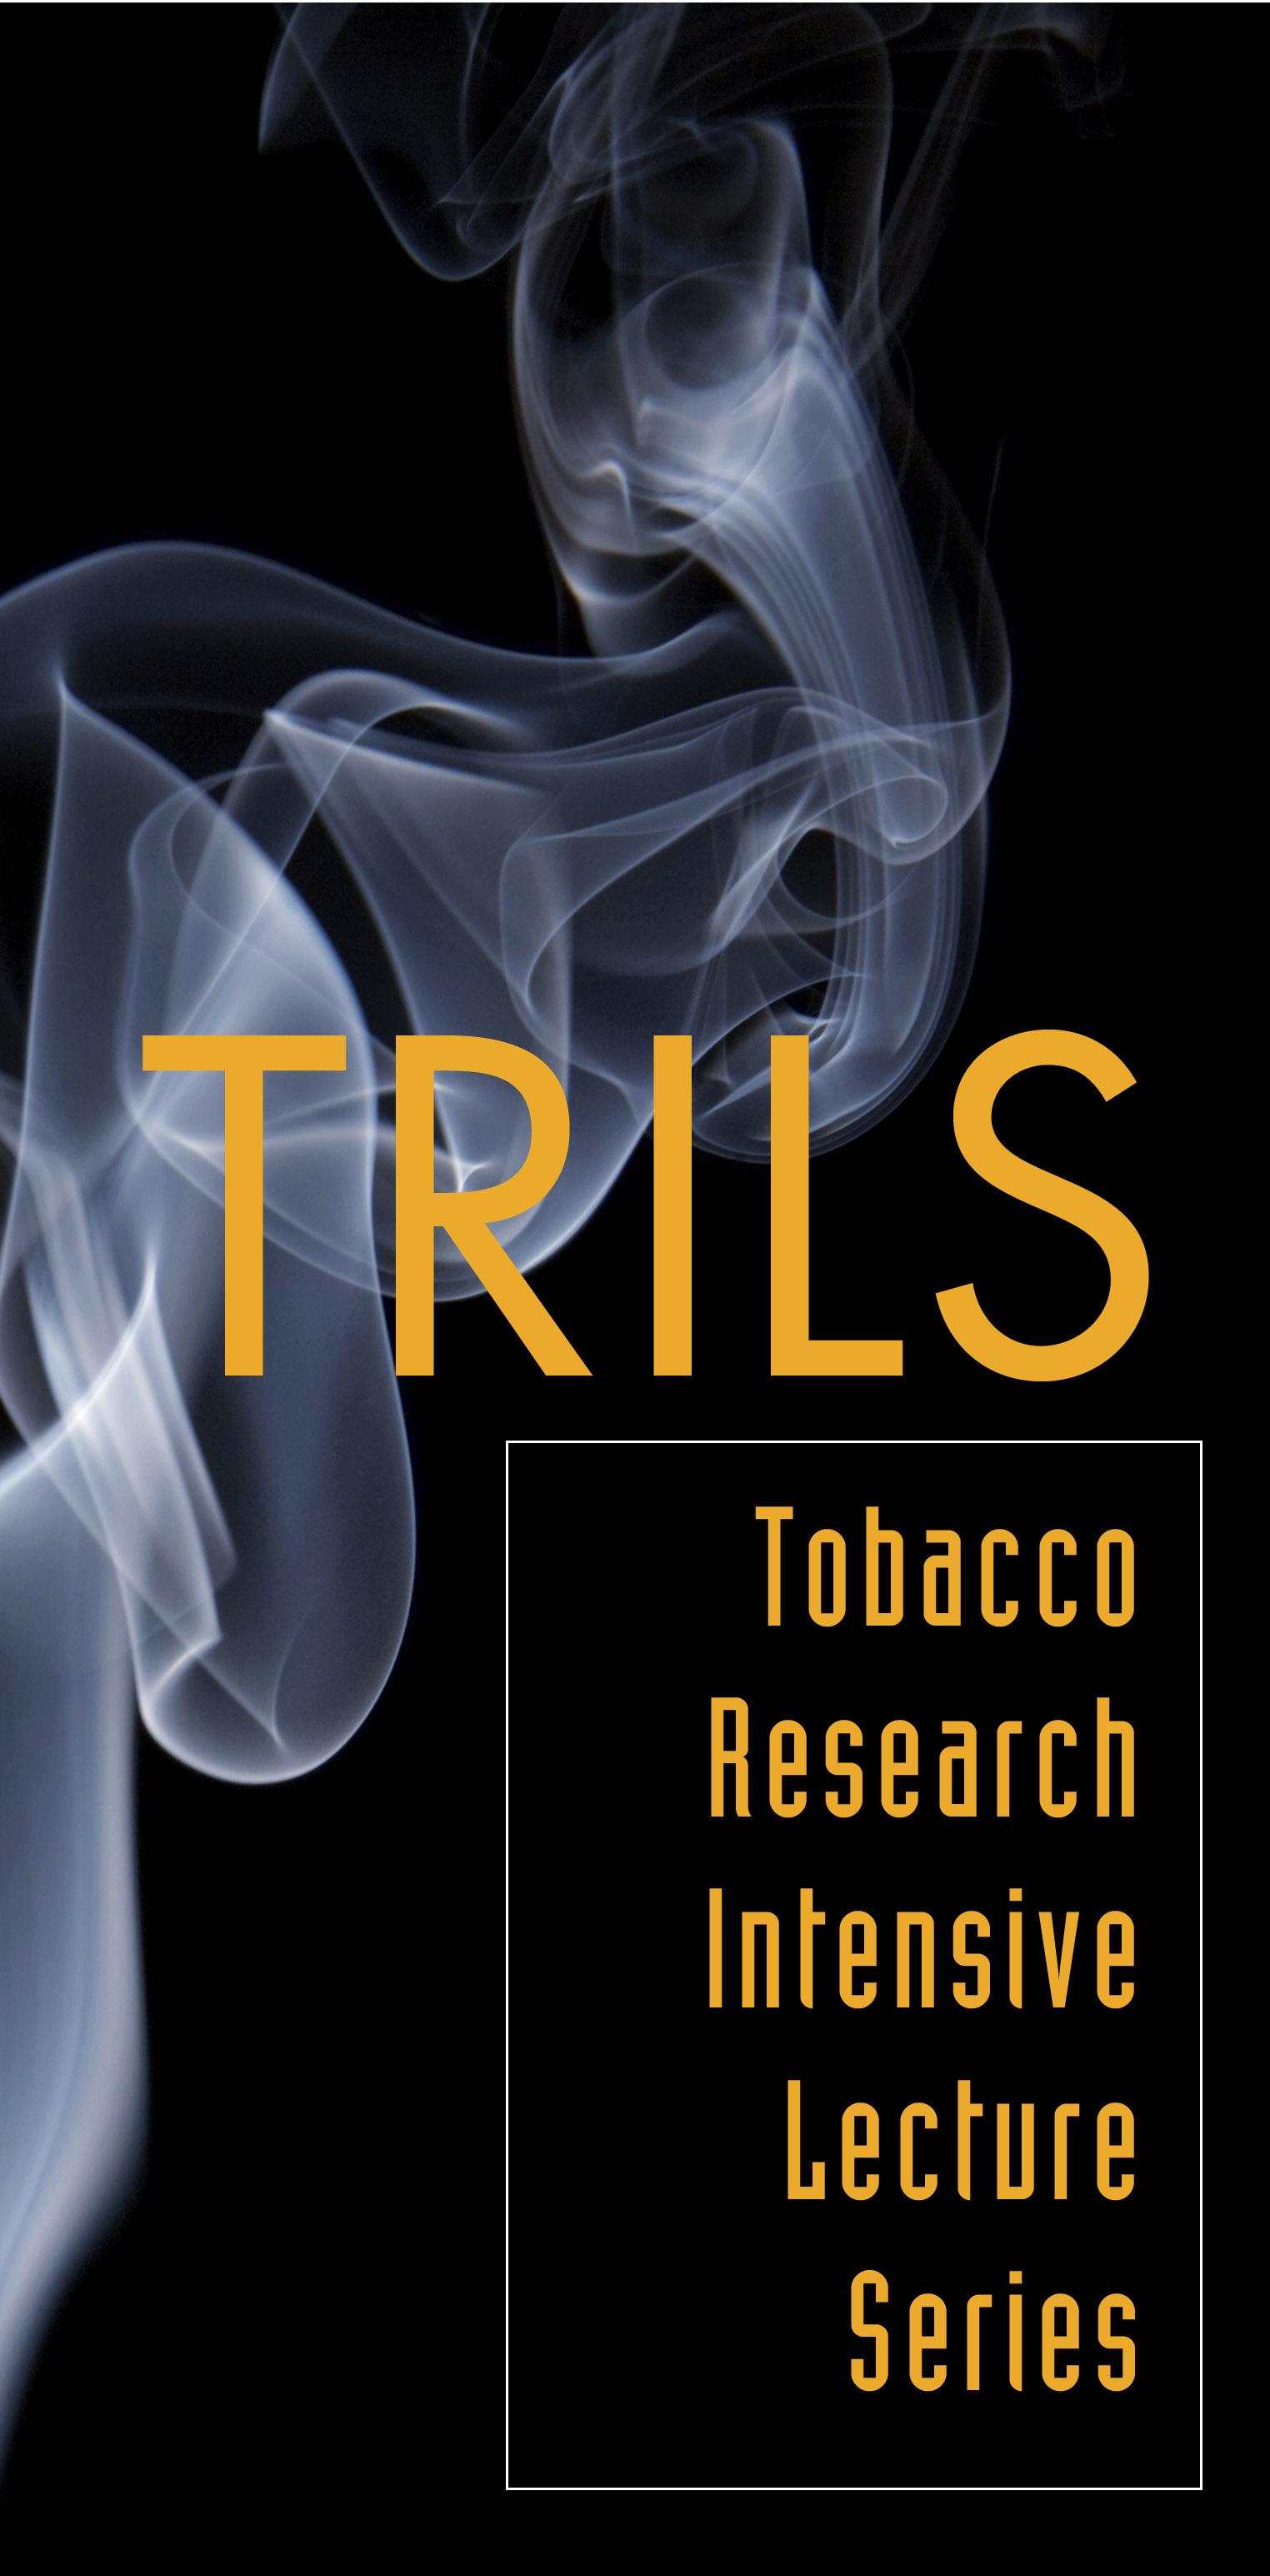 TRILS logo.jpg